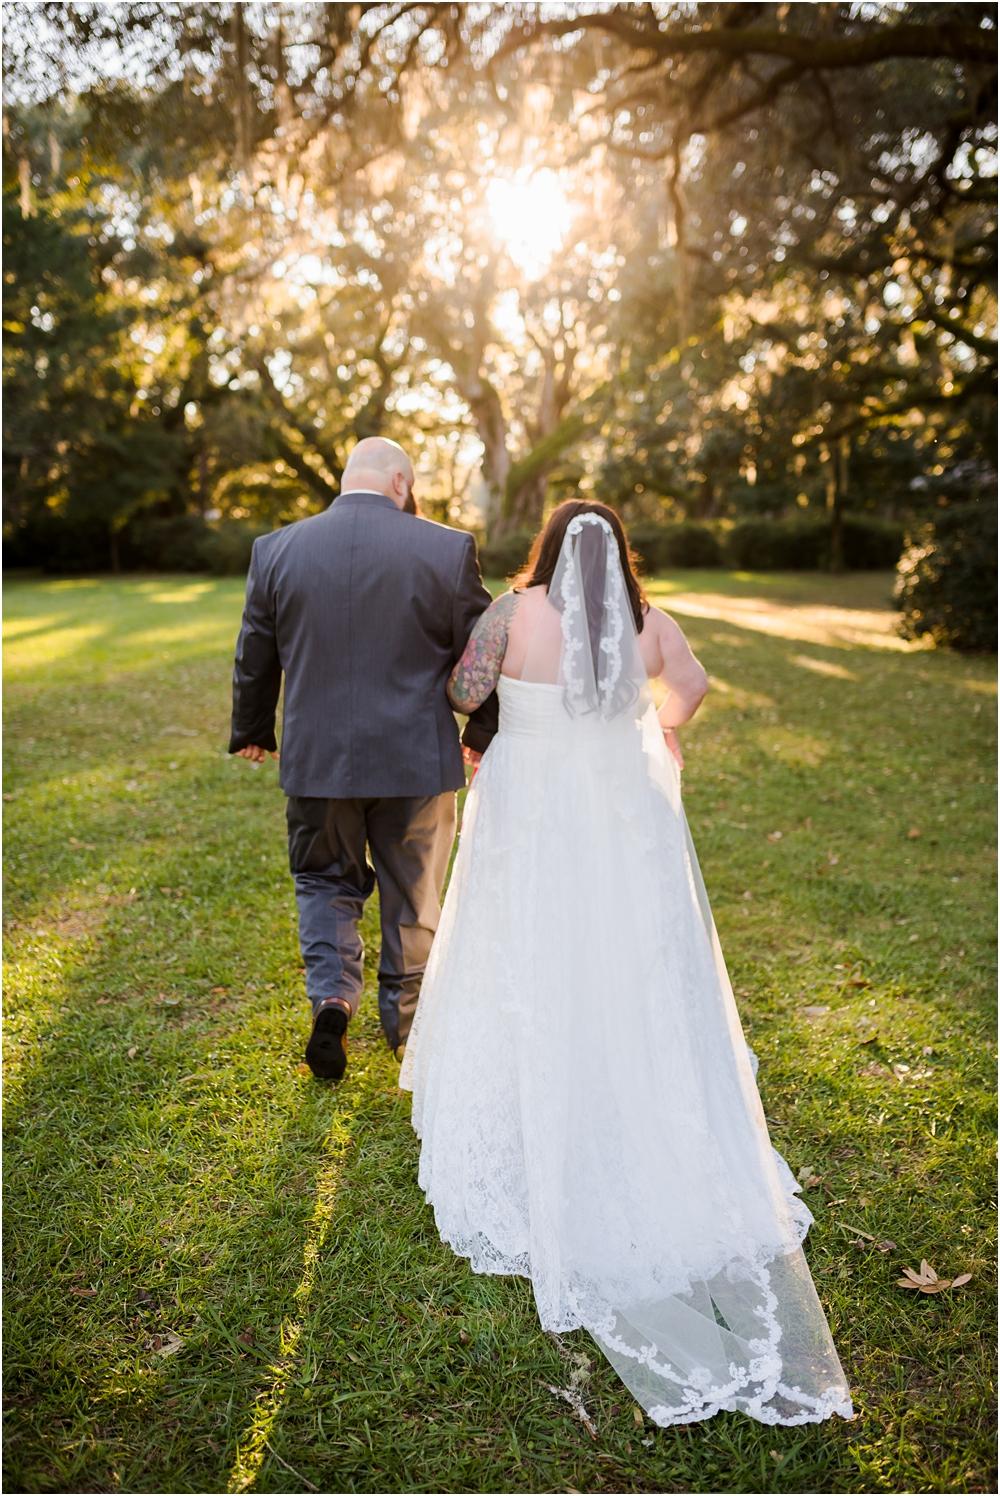 Eden-Gardens-florida-wedding-photographer-kiersten-stevenson-photography-78.jpg